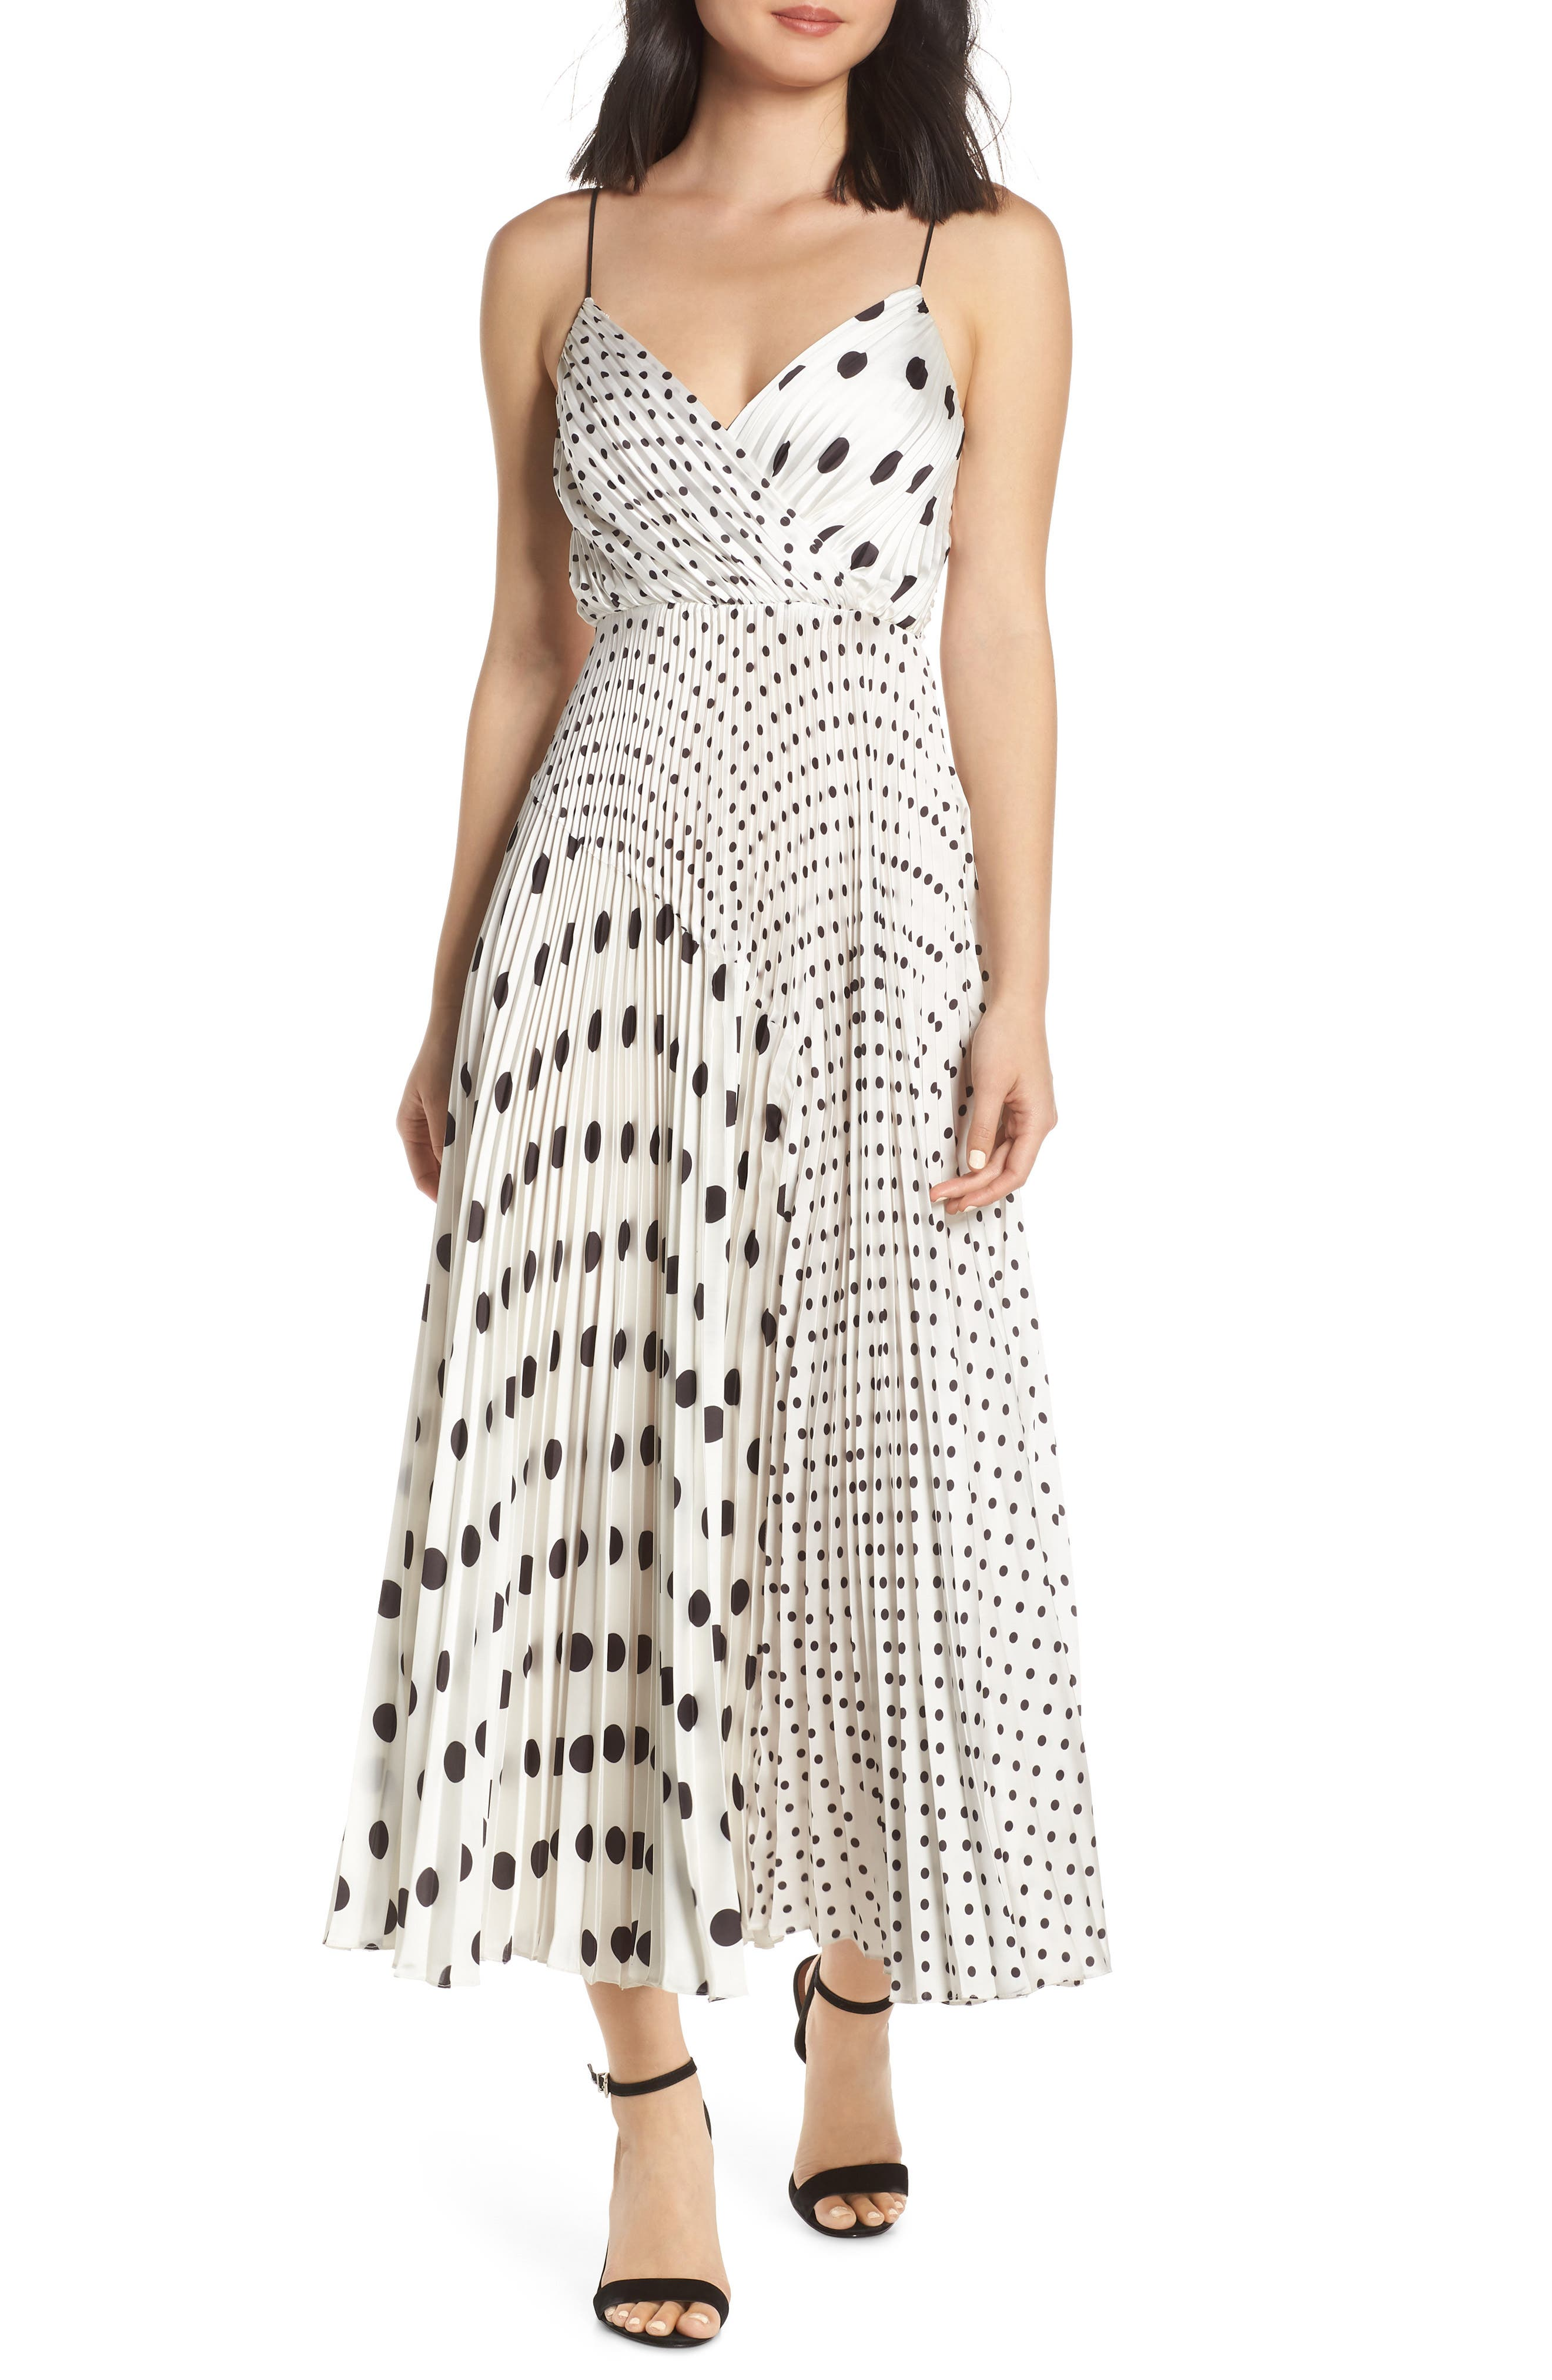 Jill Jill Stuart Polka Dot Mix Print Midi Dress, White